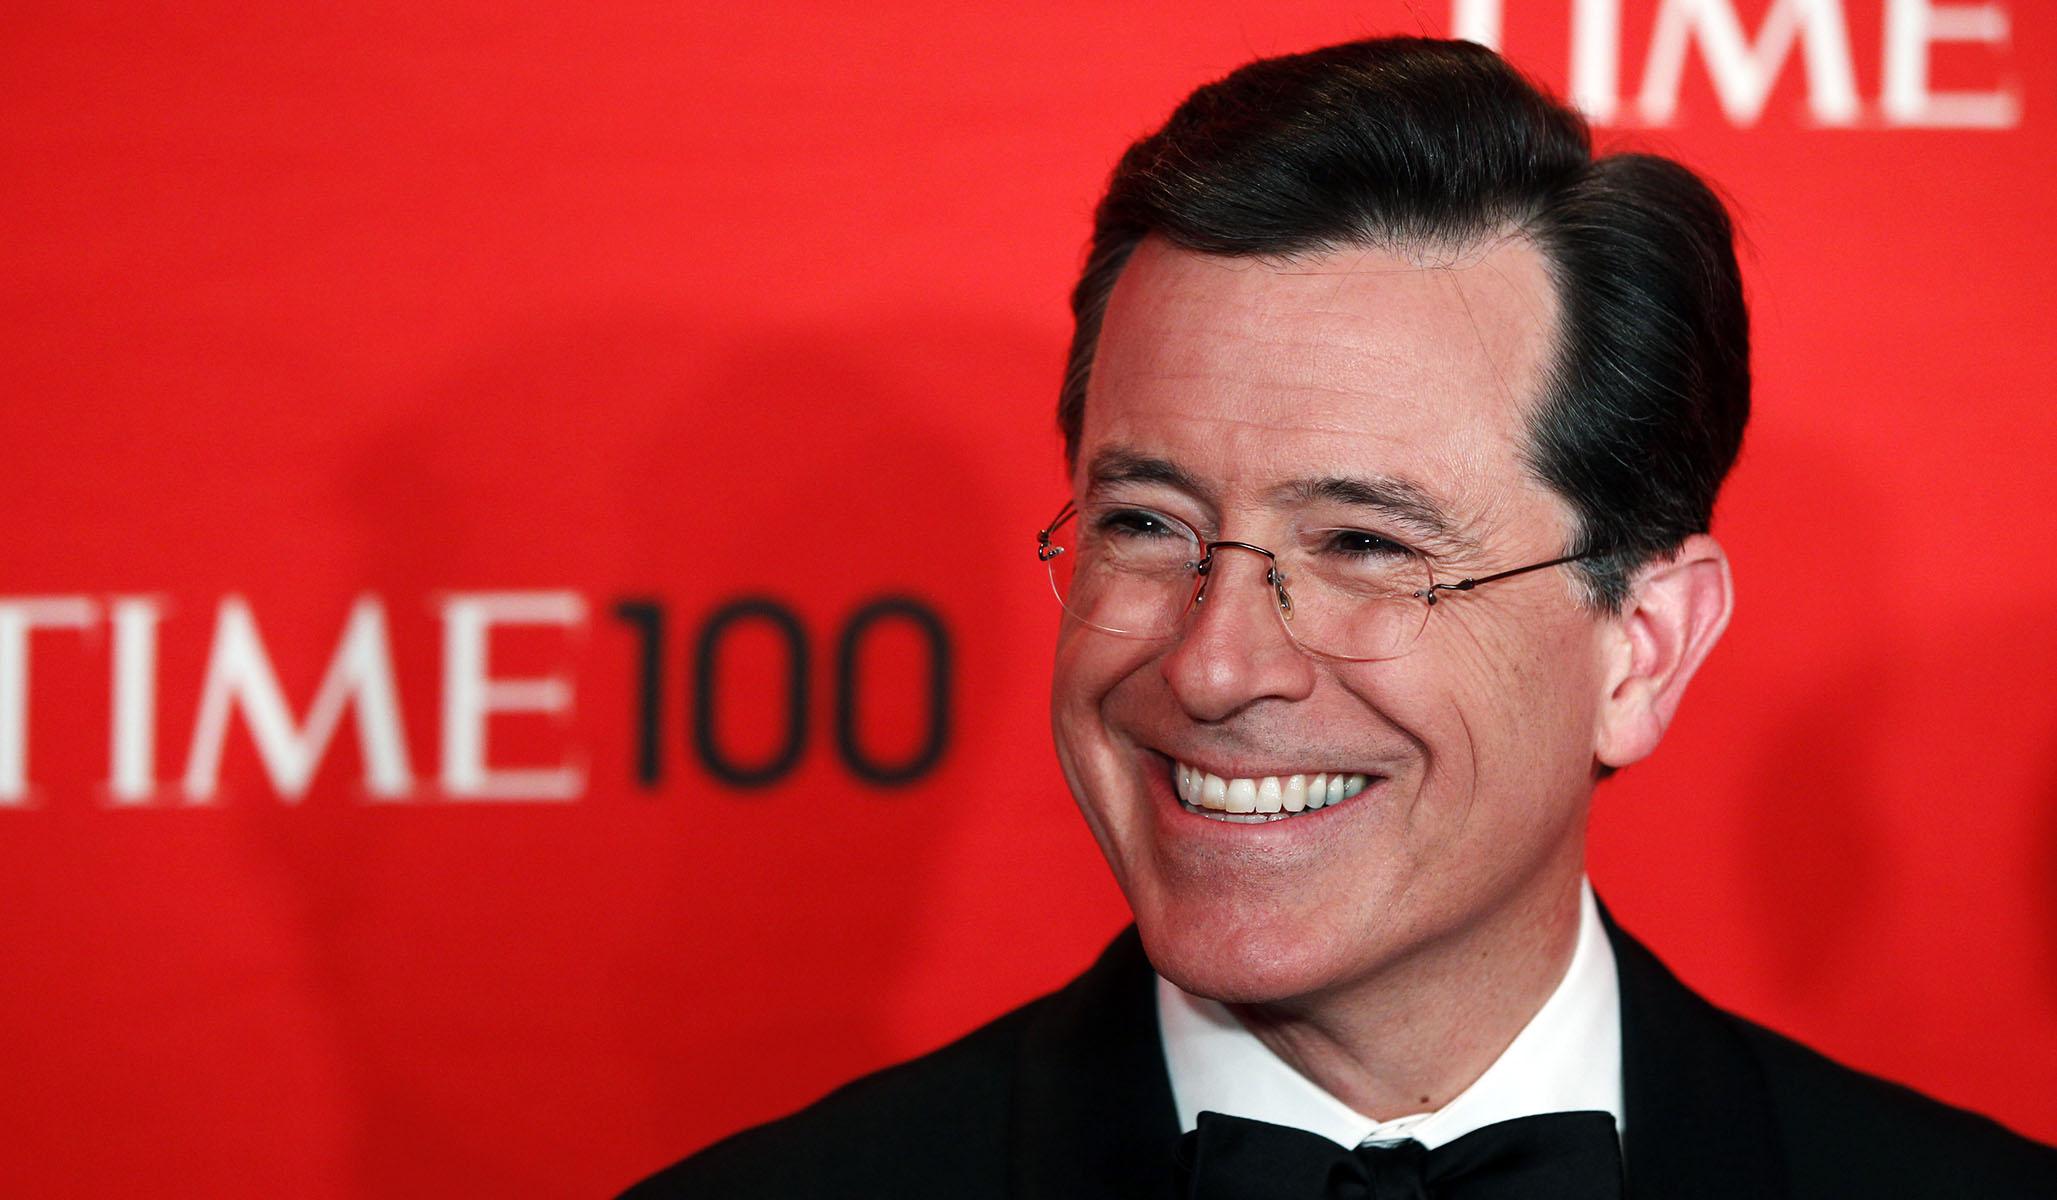 Stephen Colbert Mocks Warren's Refusal to Admit She Will Raise Taxes